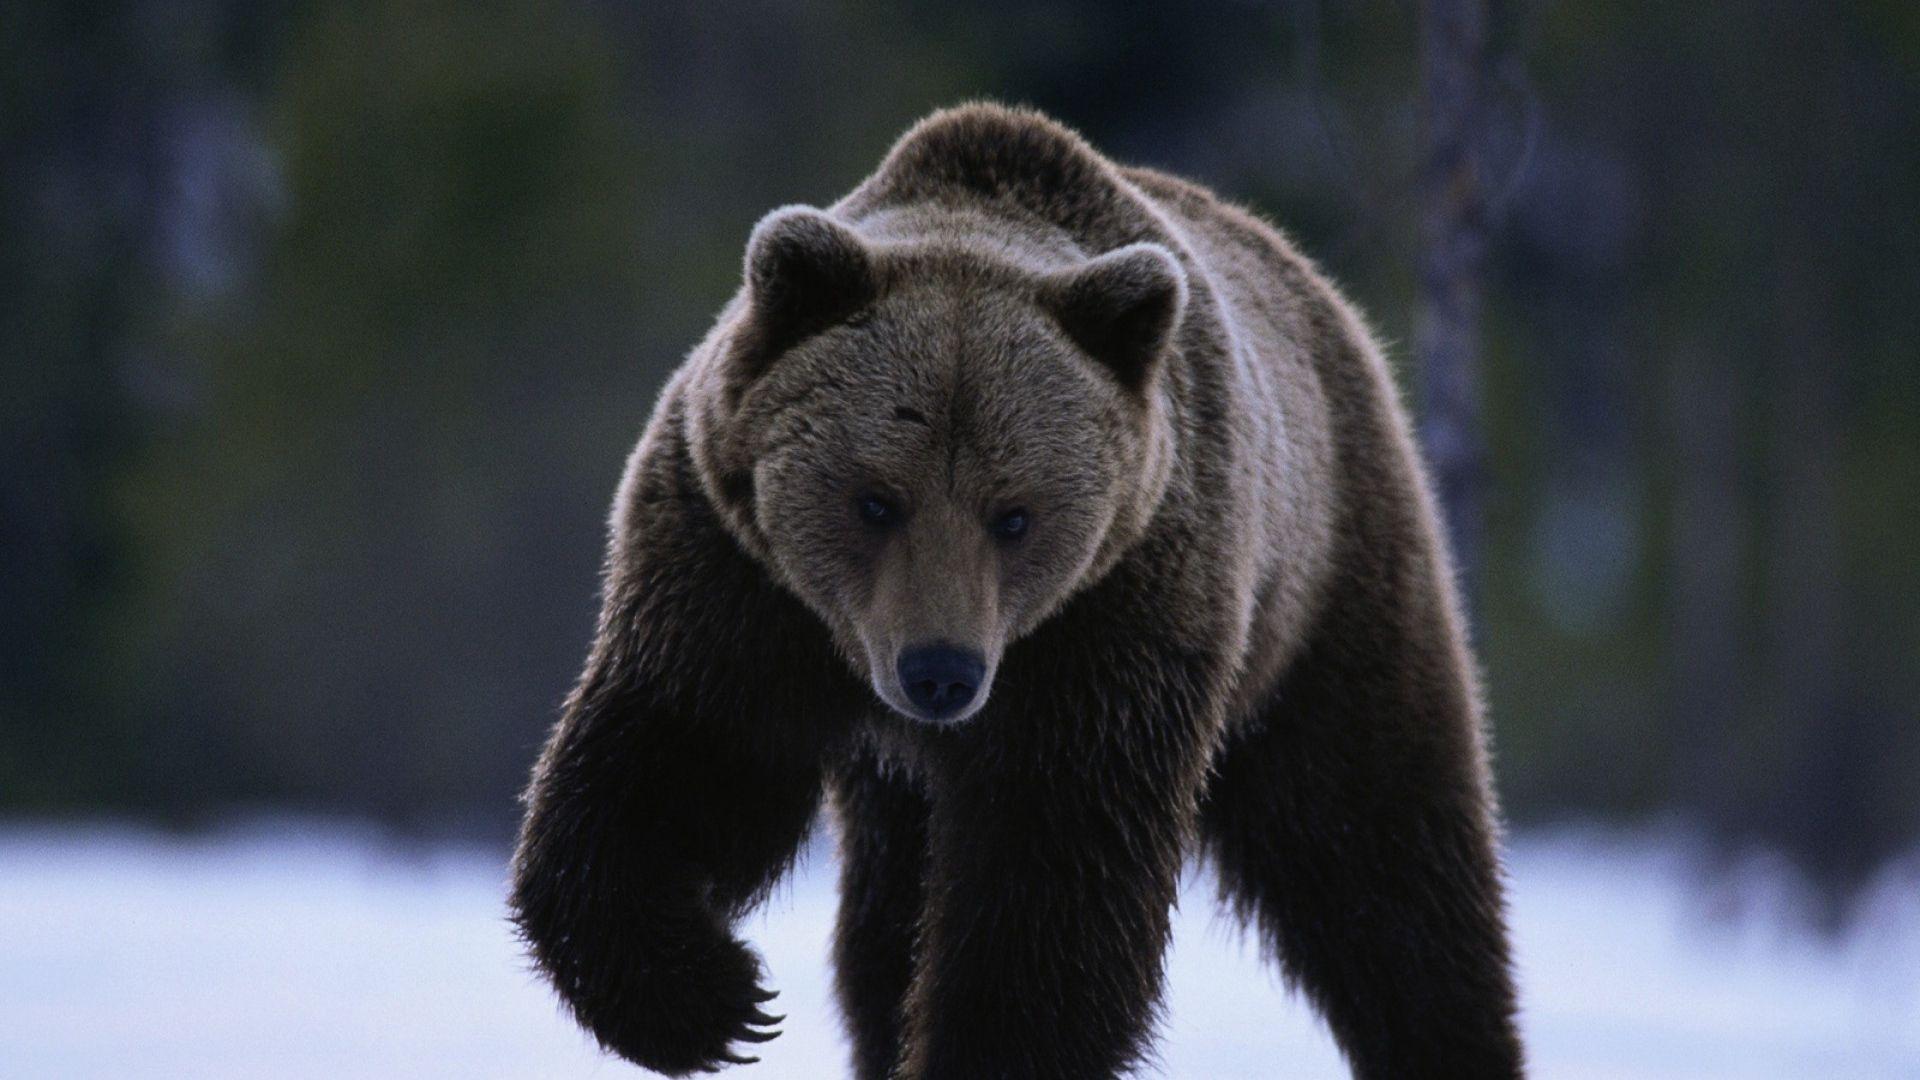 Download Bear, Snow, Walk, Beast Wallpaper, Background Full Hd